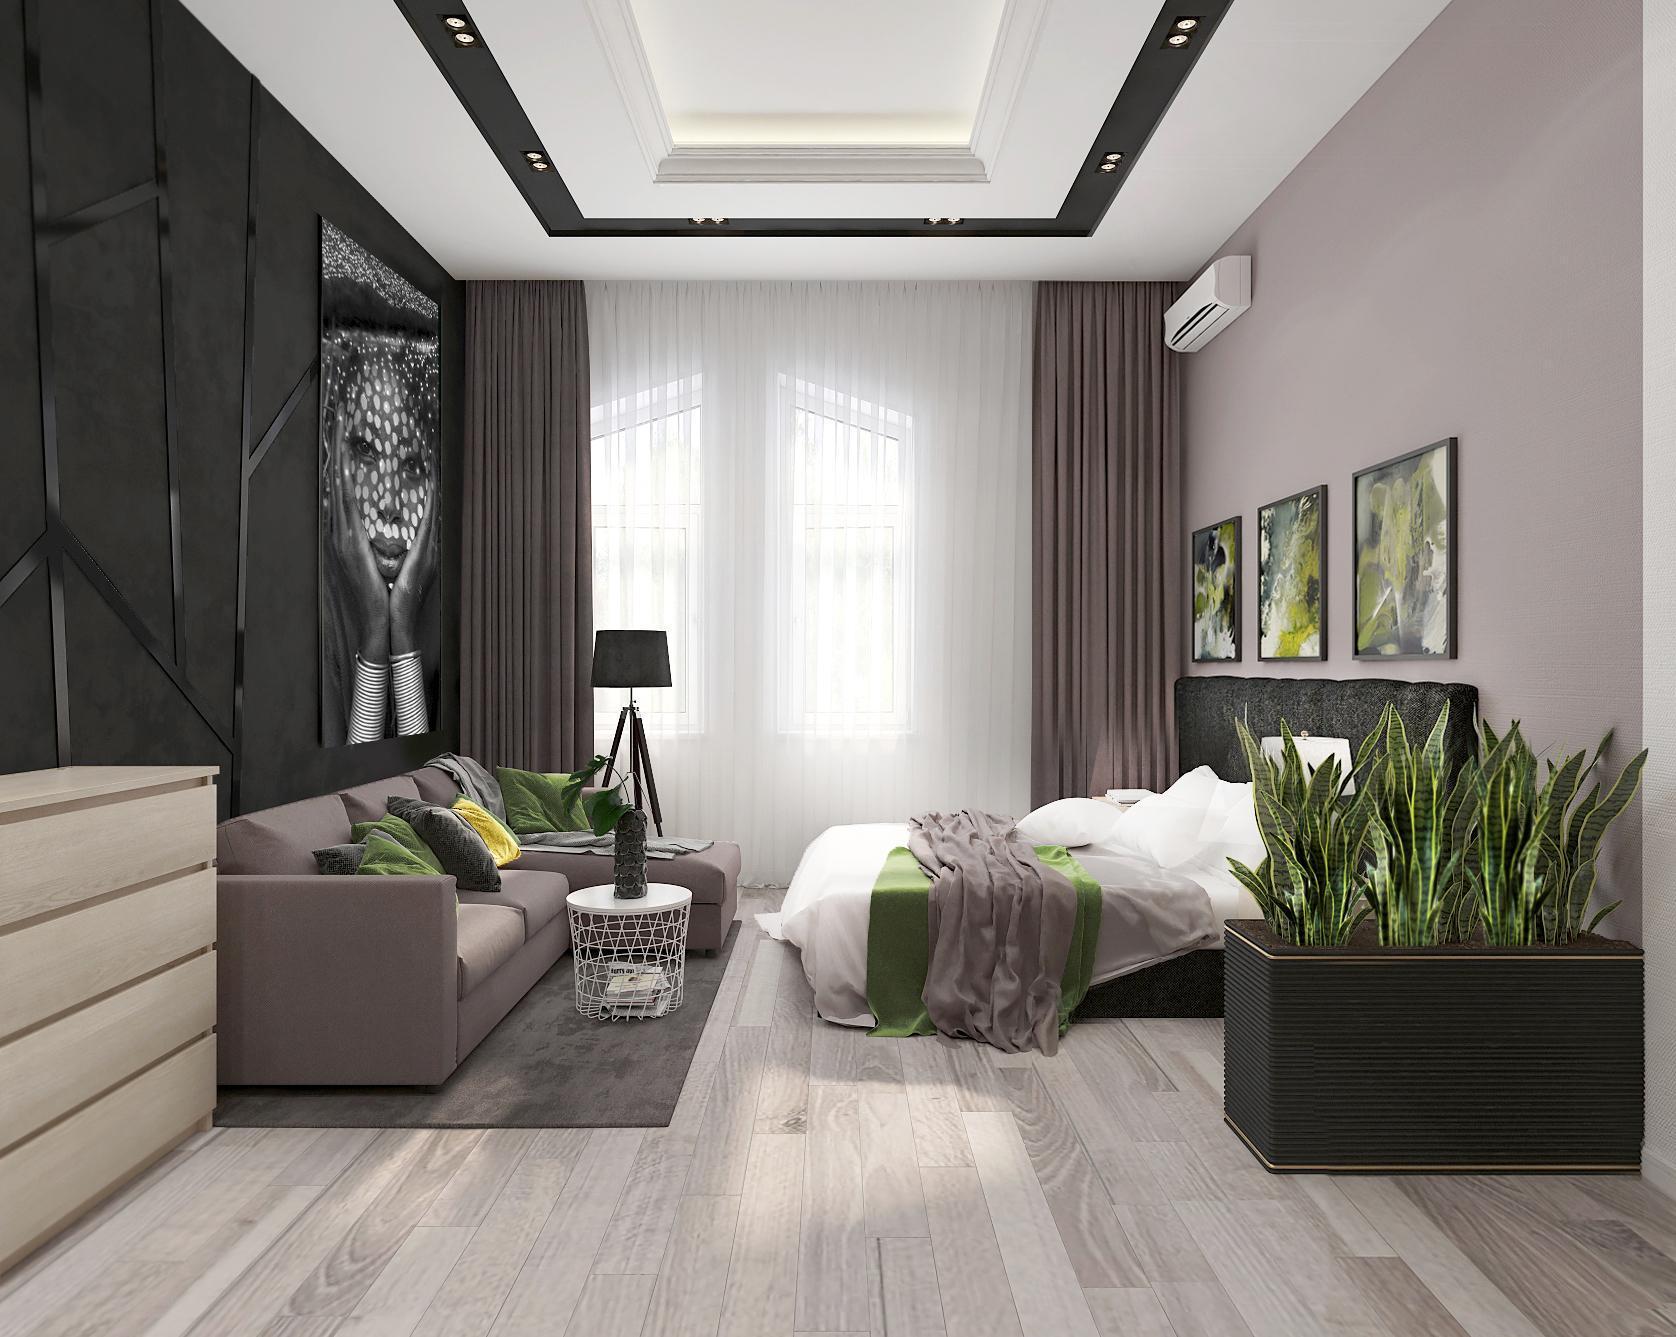 VIP 2 Bedroom Studio On Luteranska 3